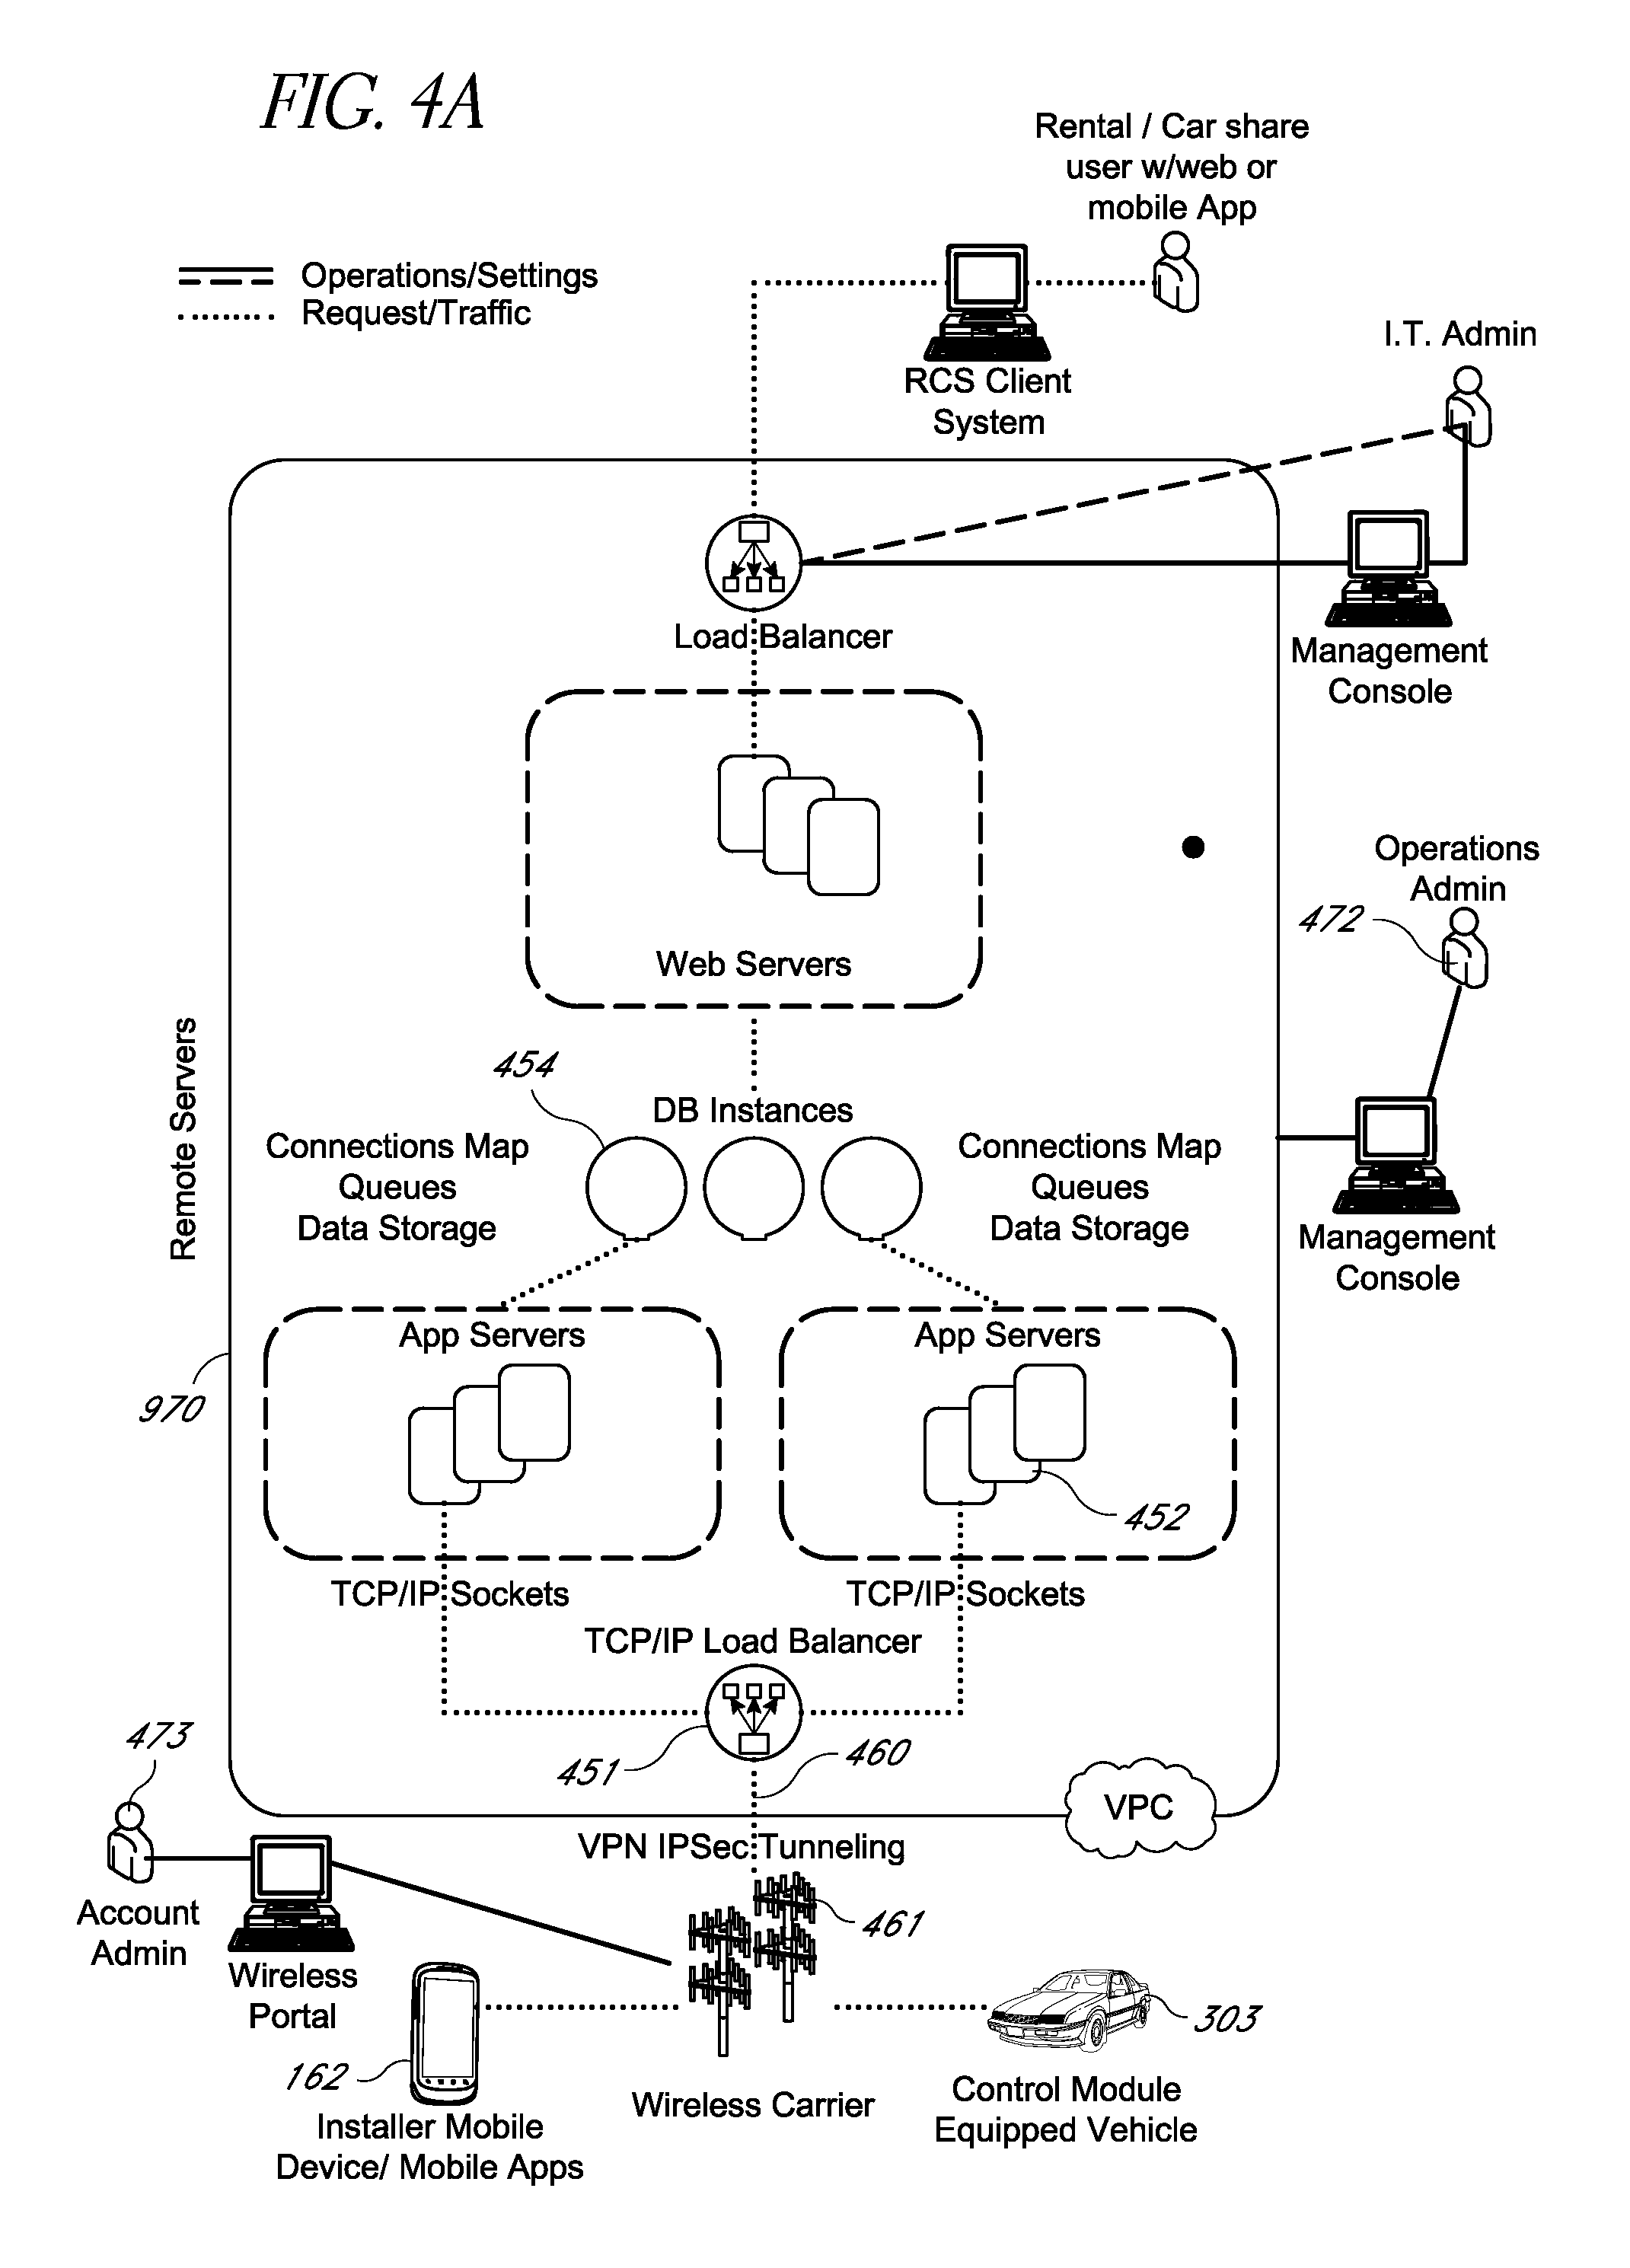 Patent US 9,373,201 B2